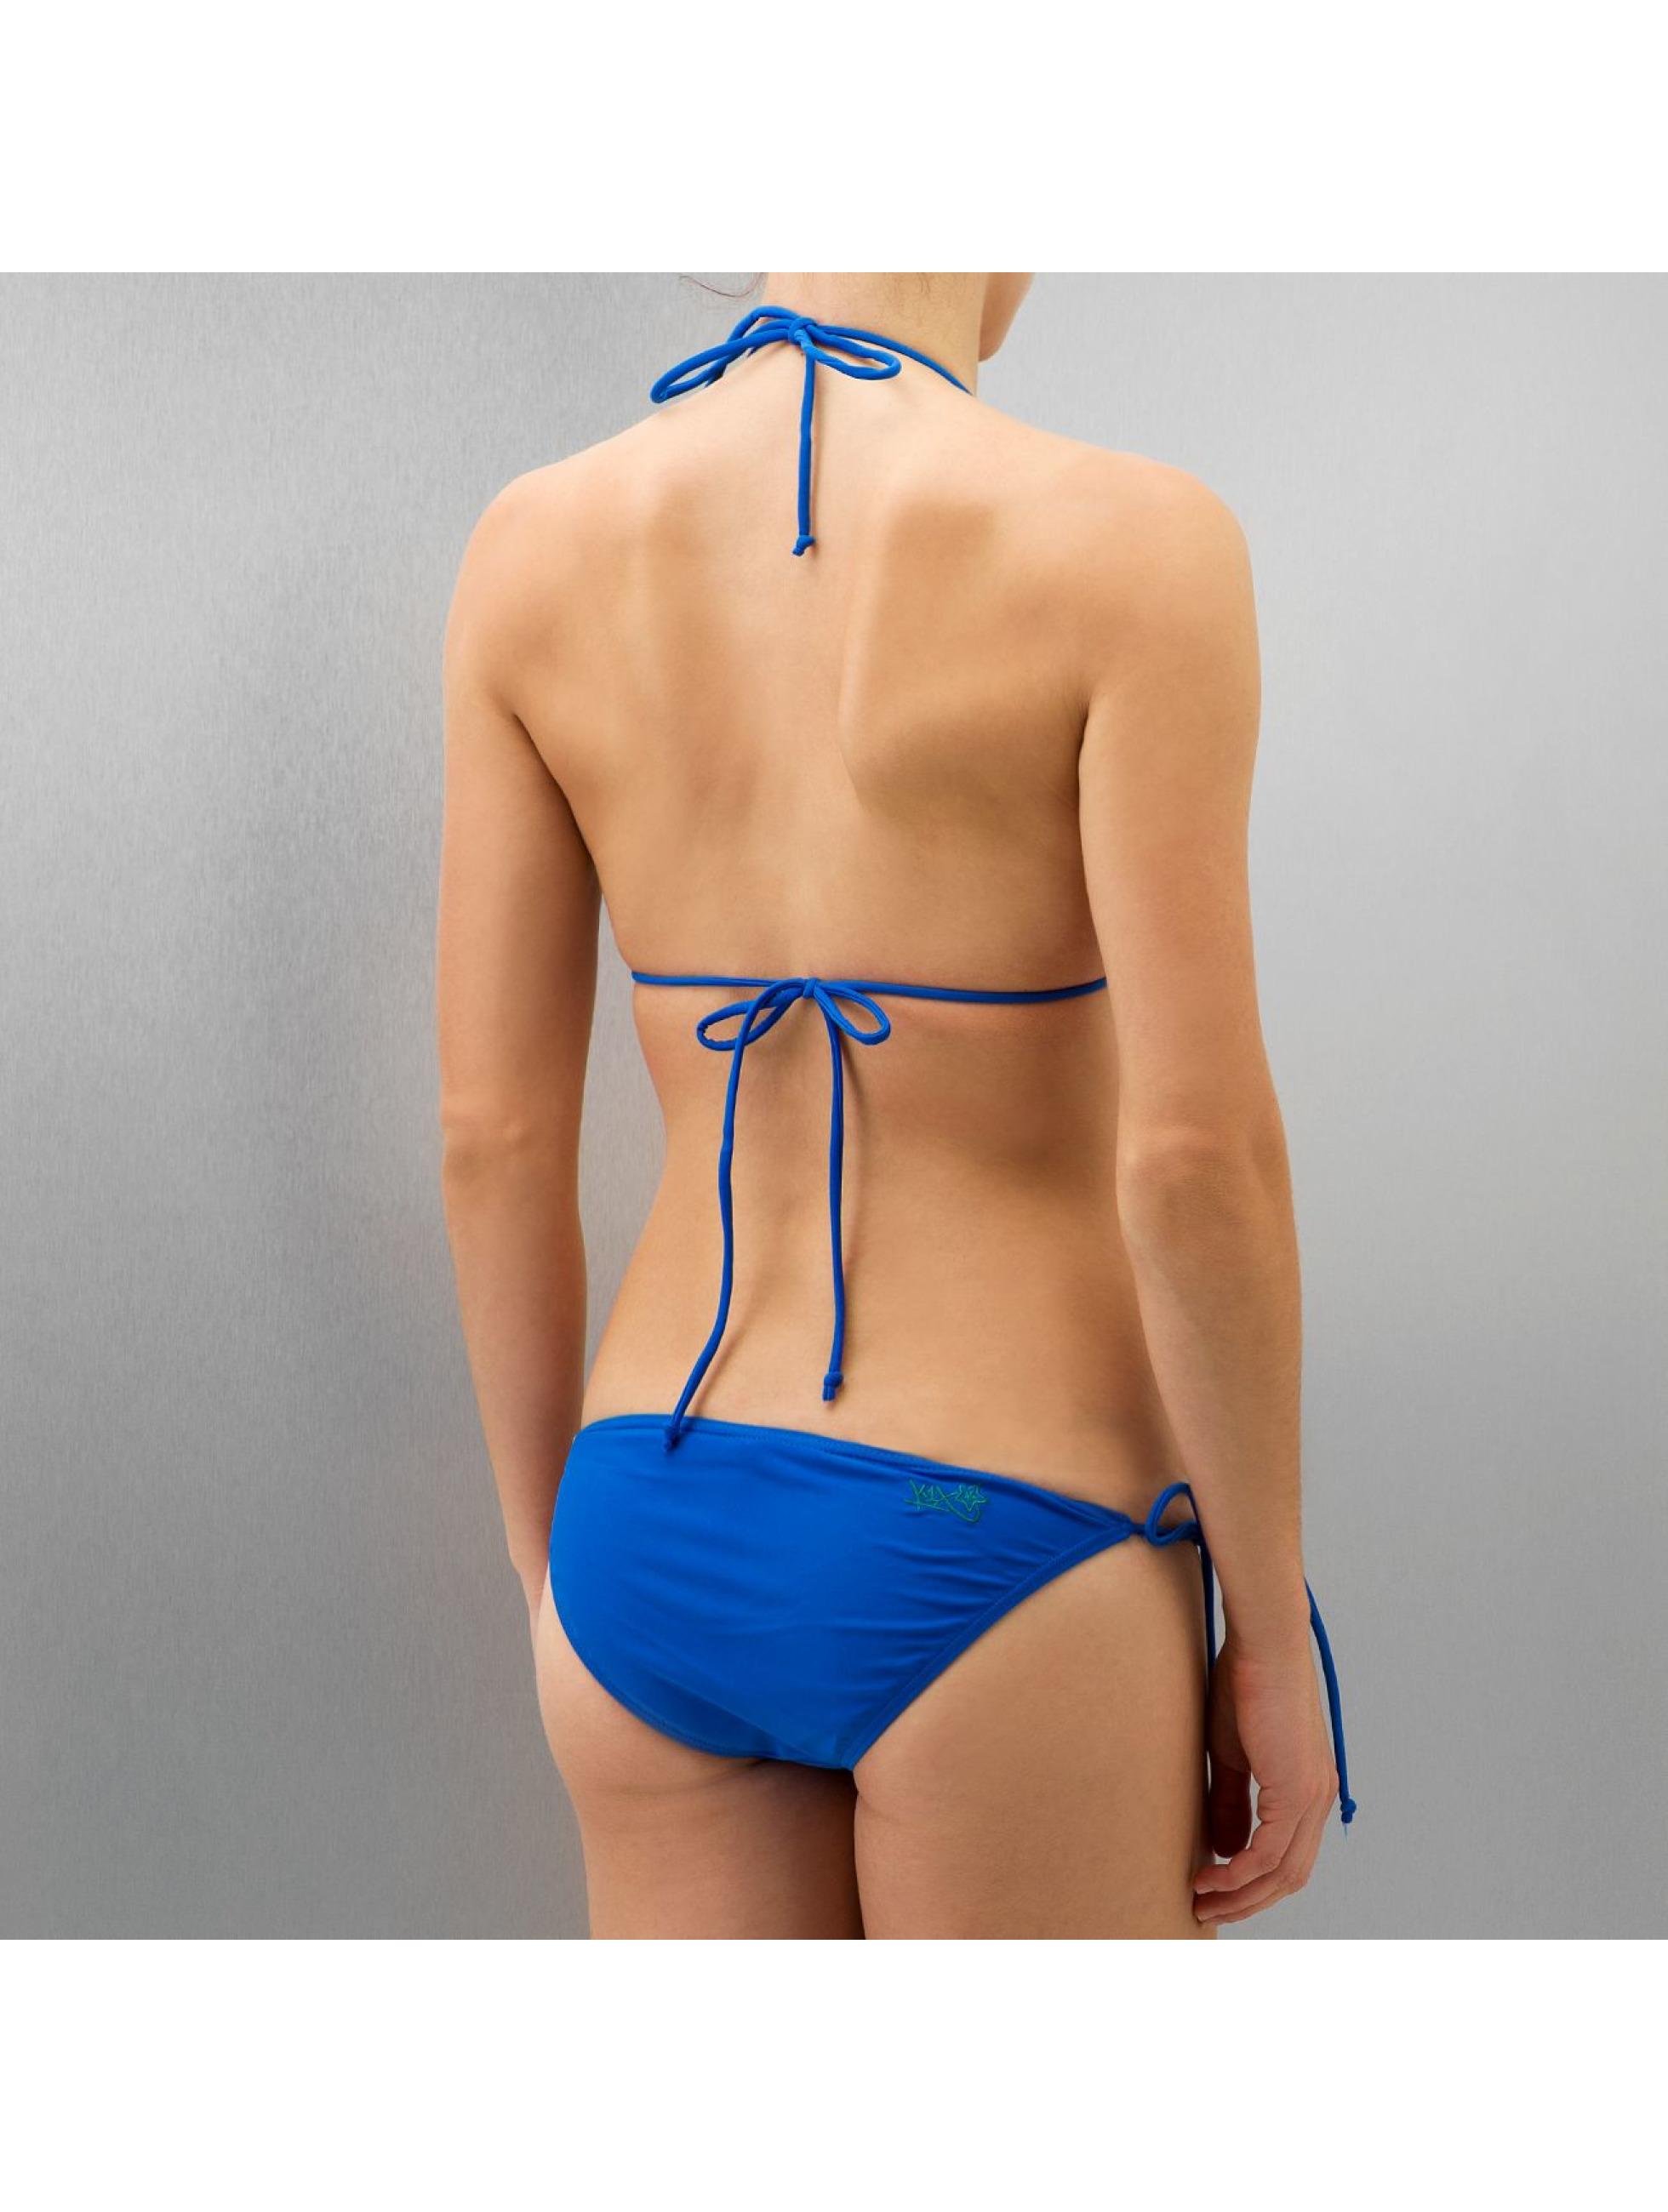 Bikinis und Bademode 2015